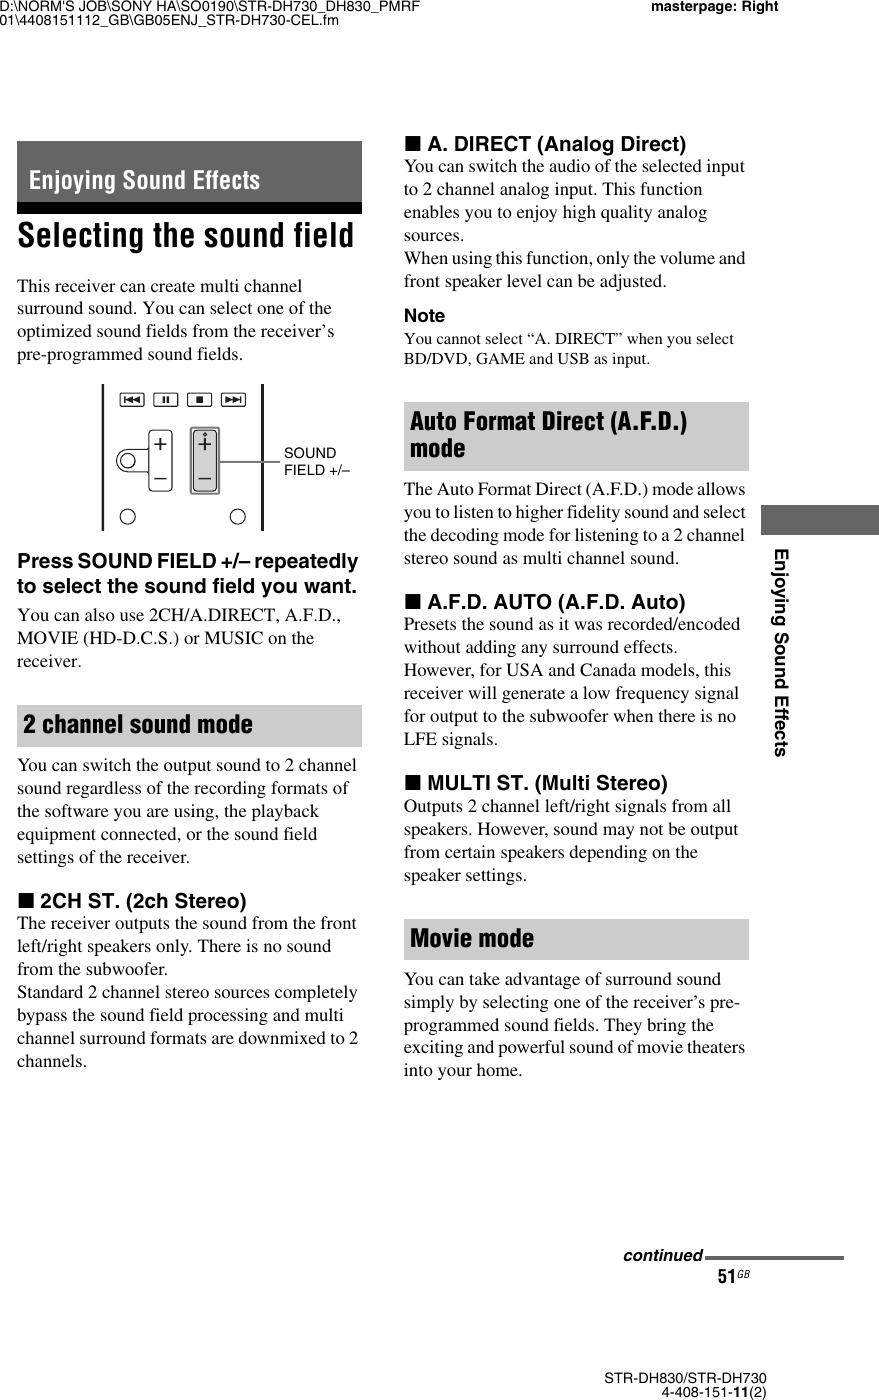 Sony Dh730 Users Manual STR DH830/STR